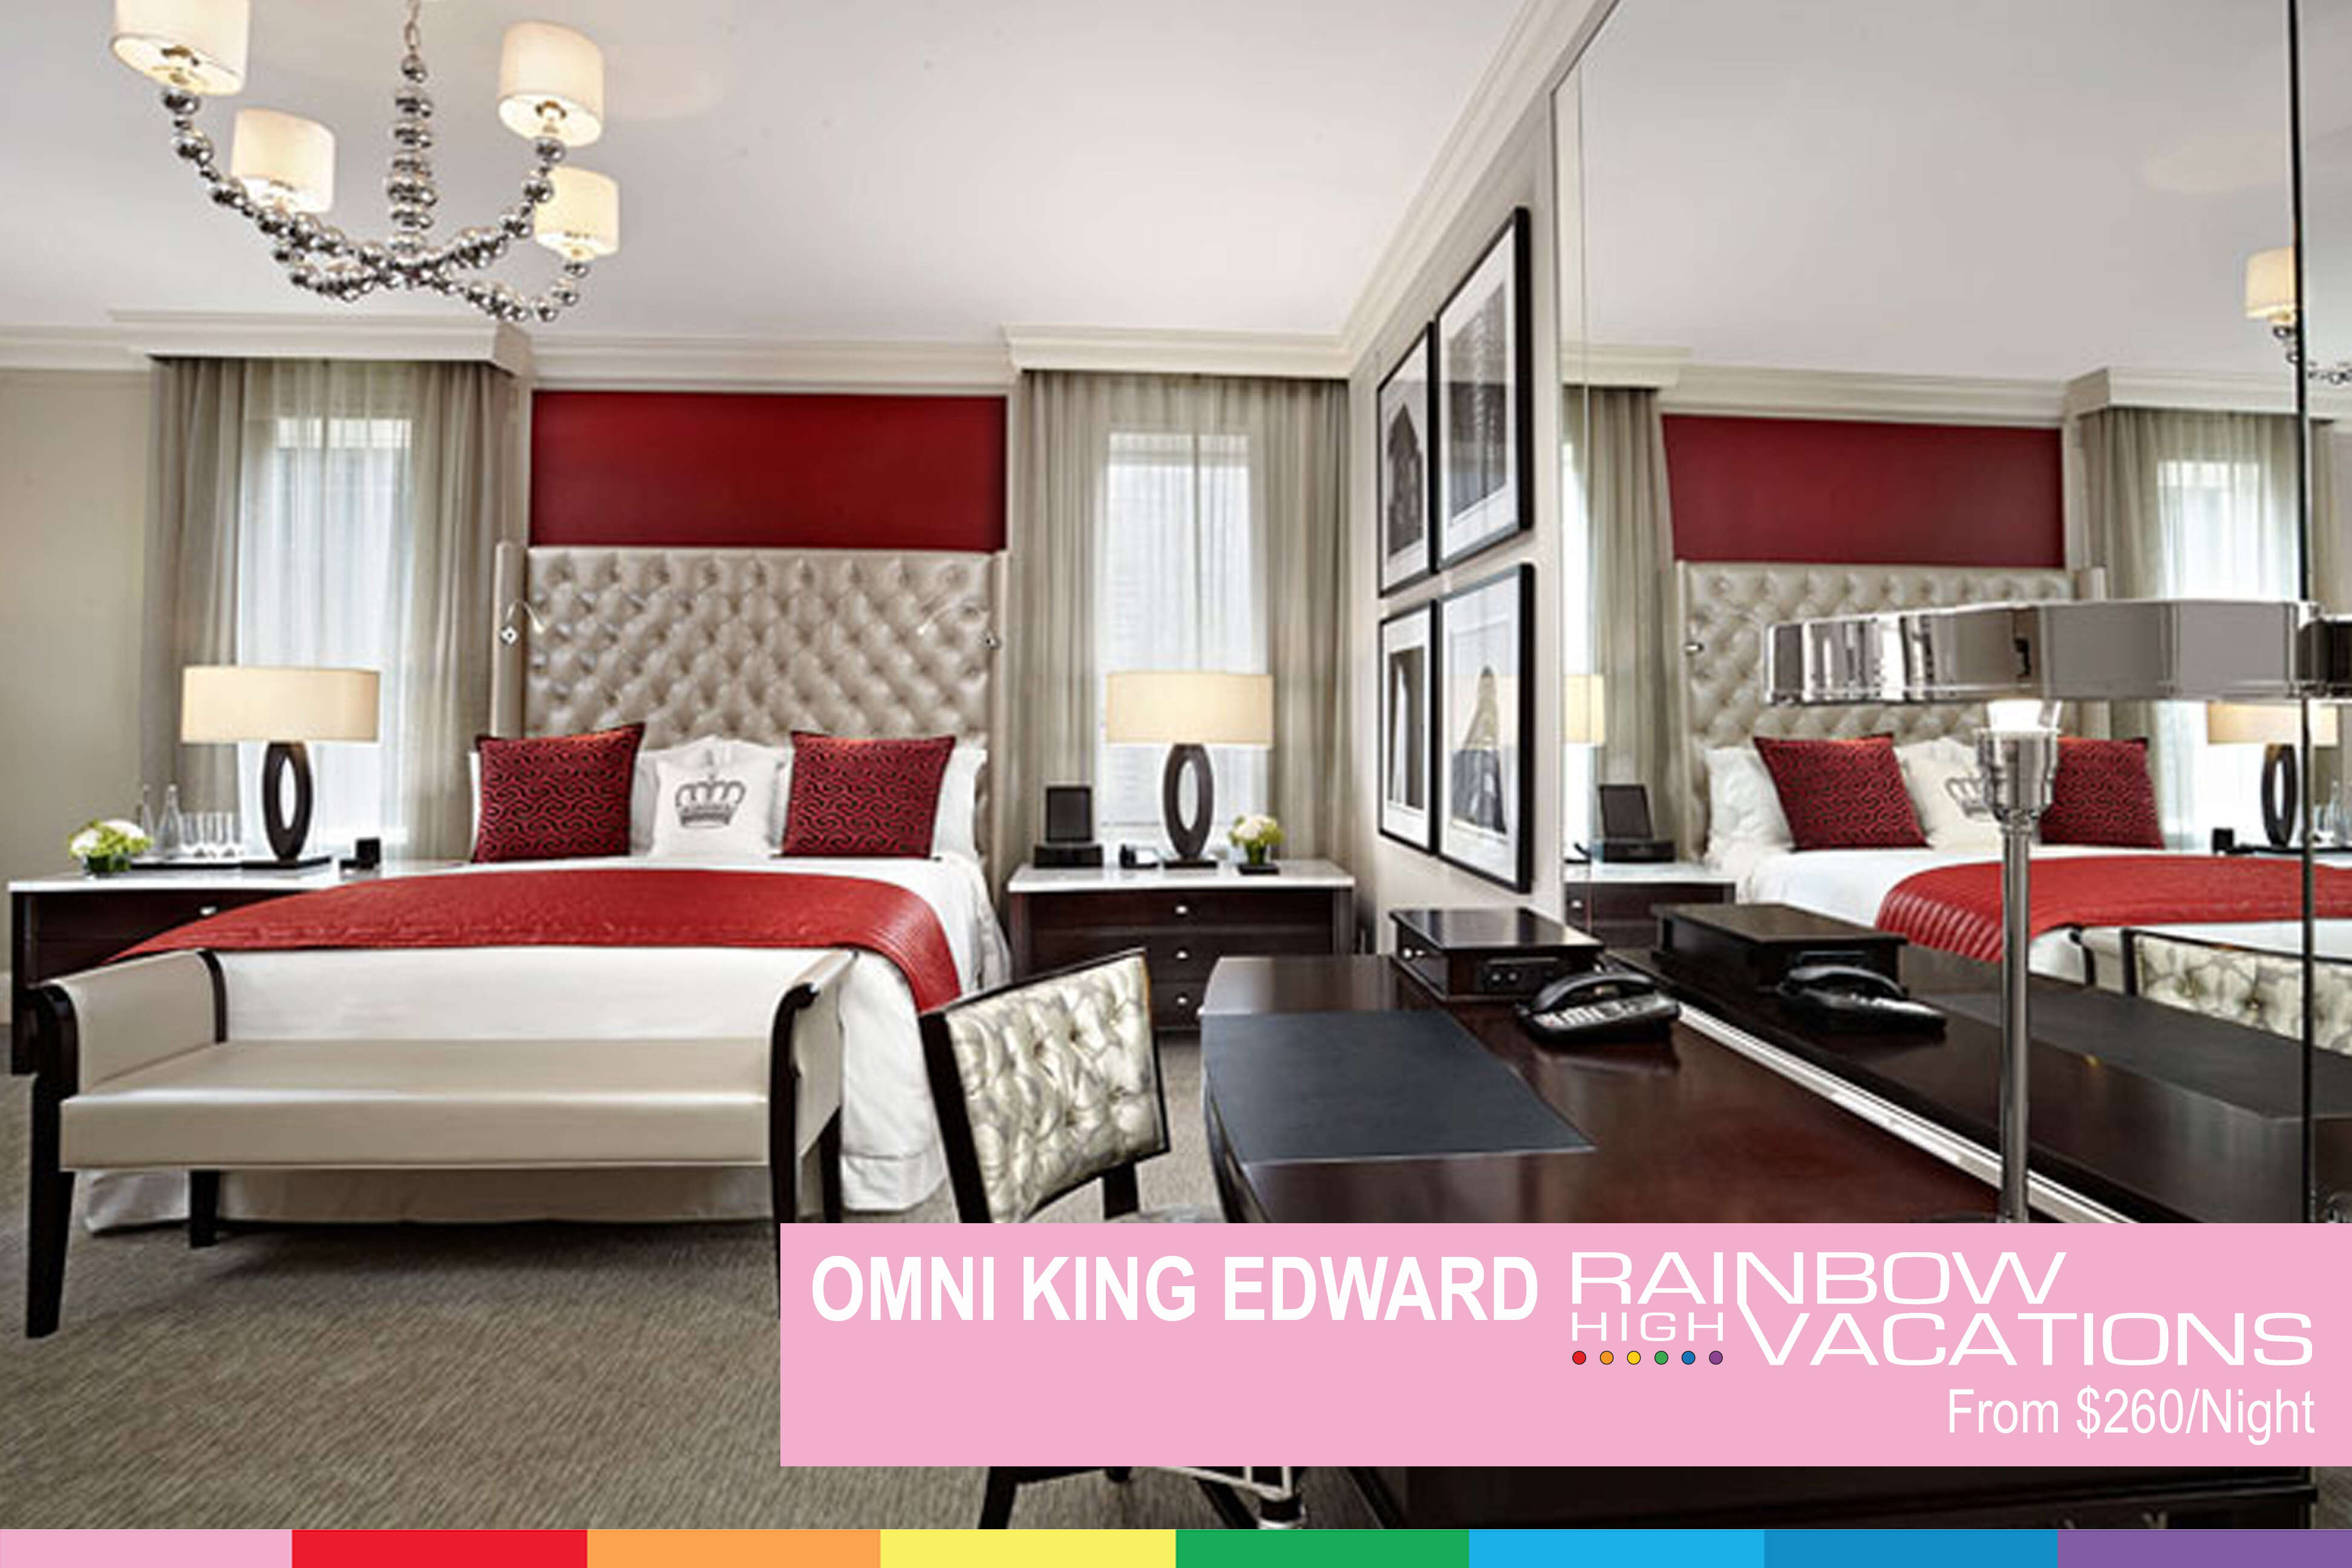 OMNI KING EDWARD